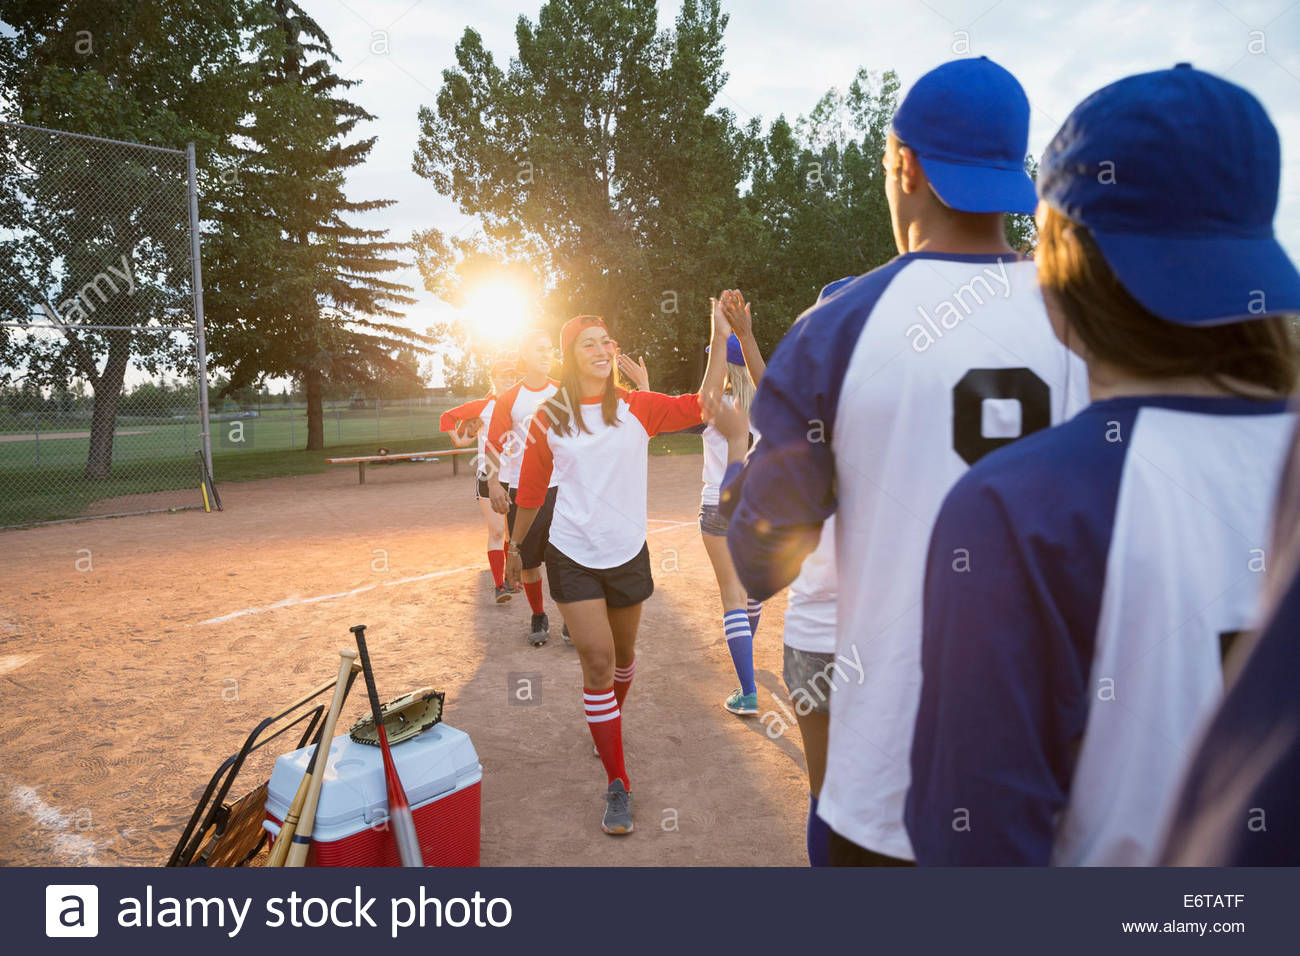 Baseball teams high filing on field - Stock Image